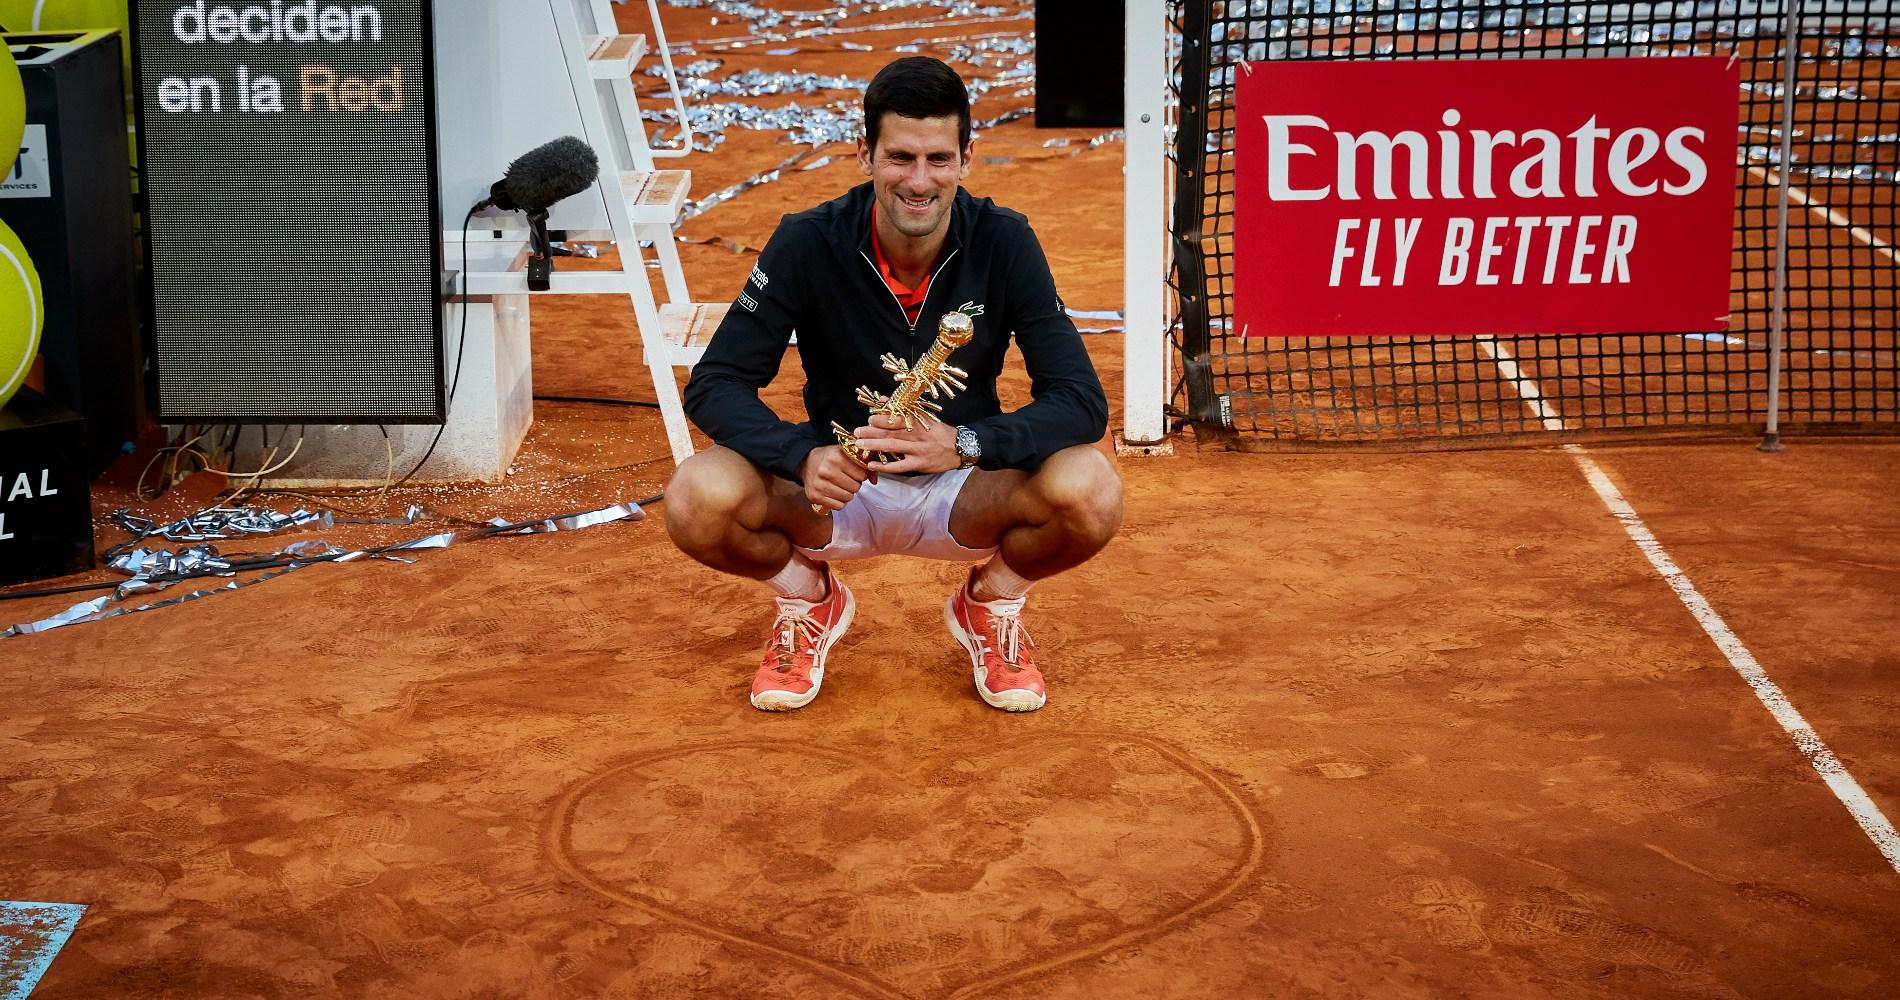 Novak Djokovic won the Mutua Madrid Open in 2019.